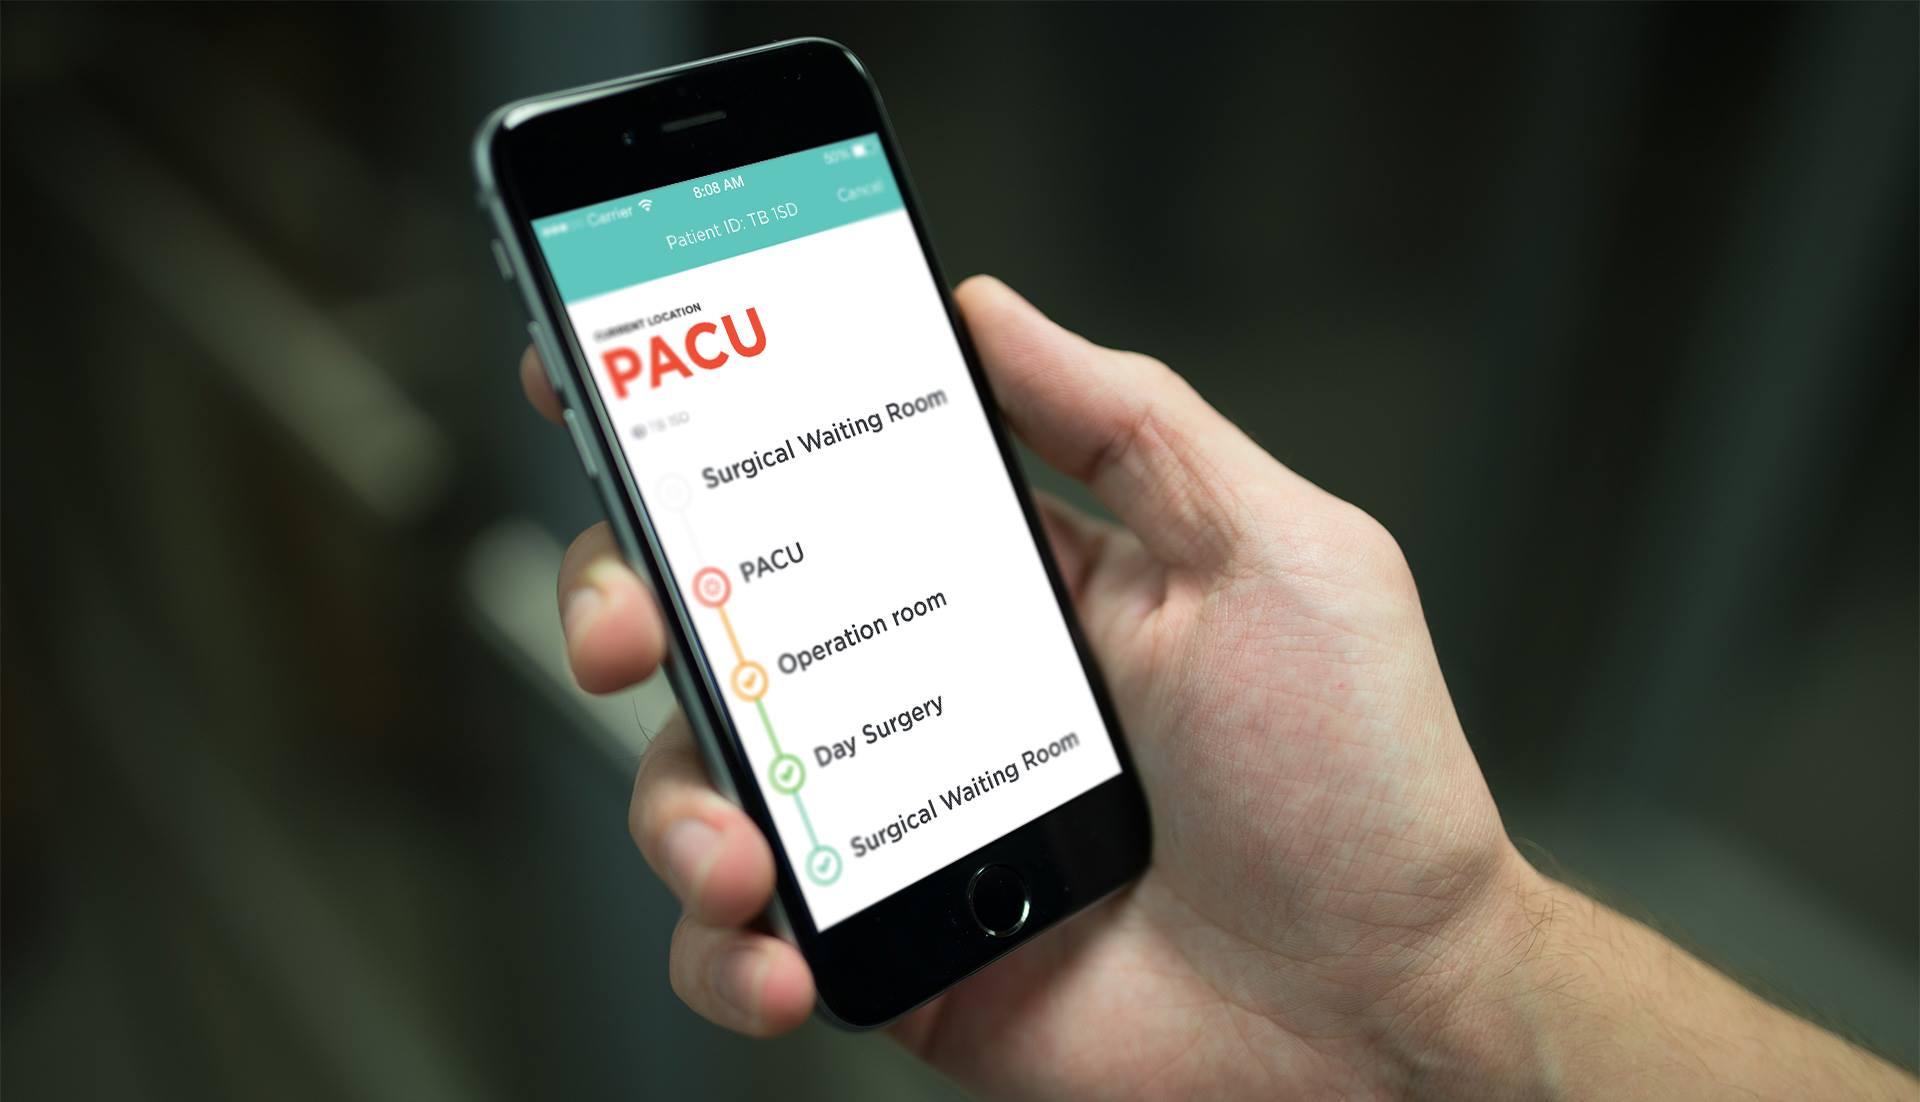 intelligent locations tracker qualitance startup medical